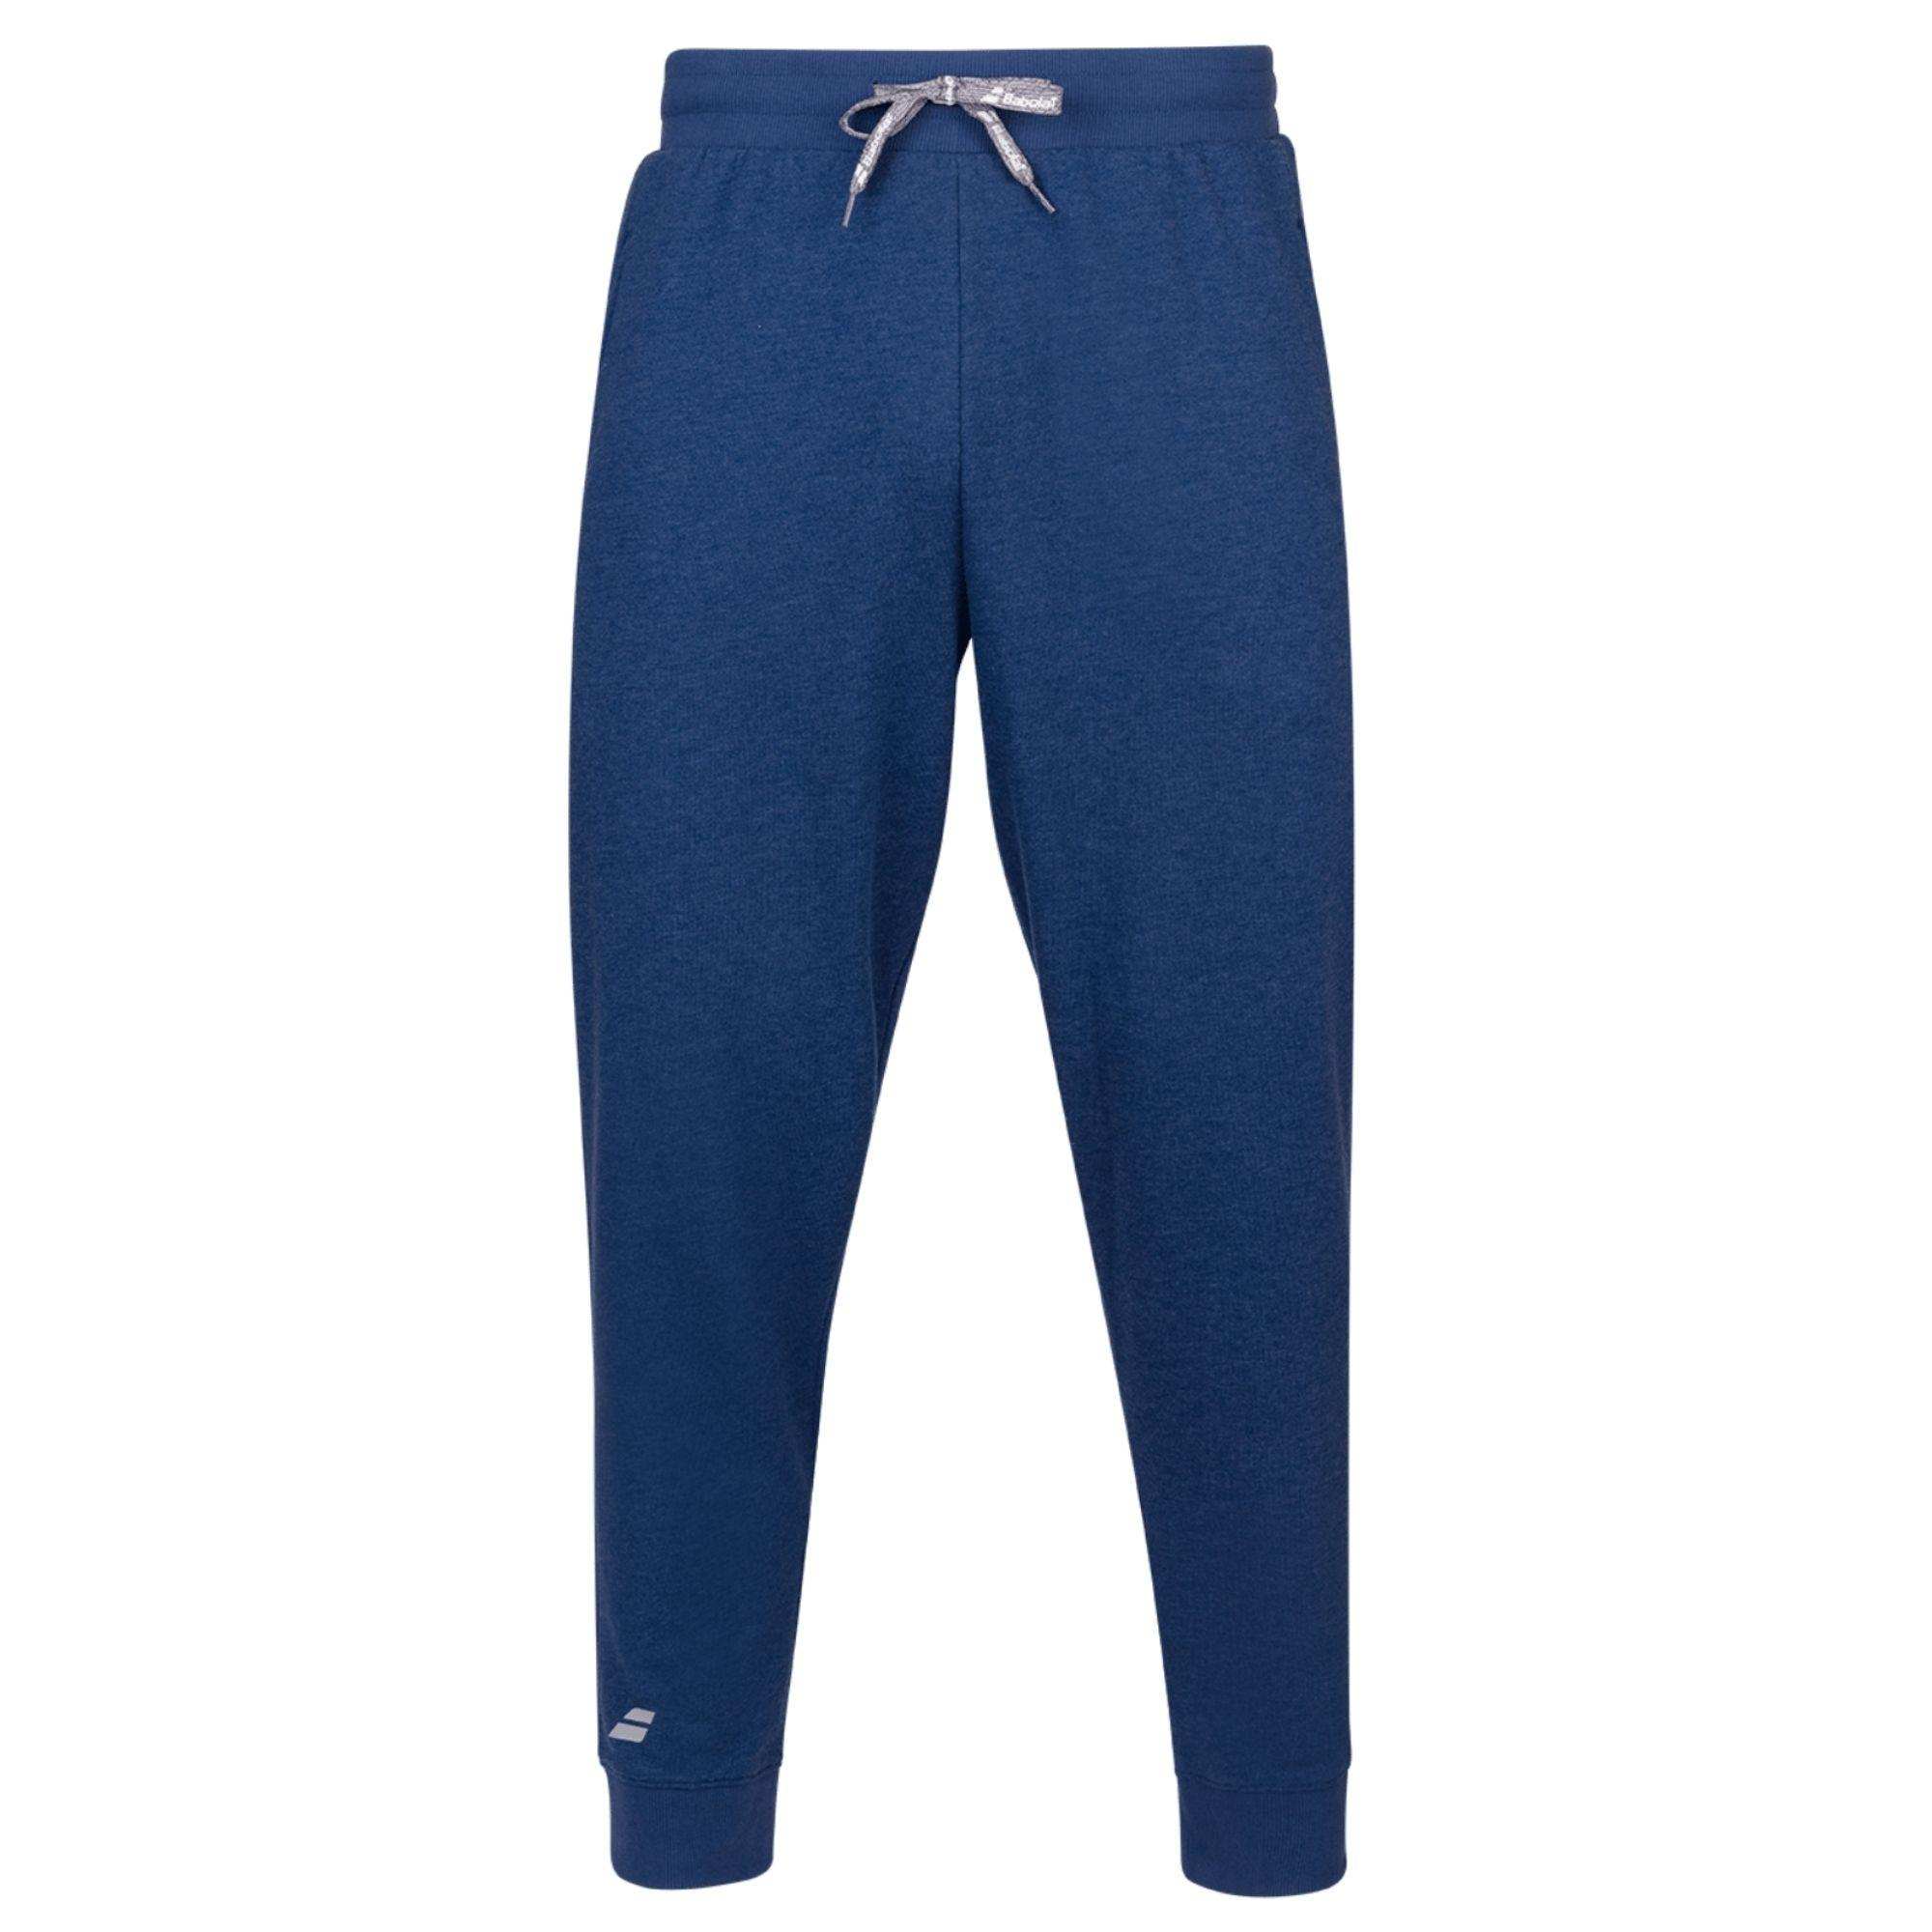 Pantalon BABOLAT largo algodon